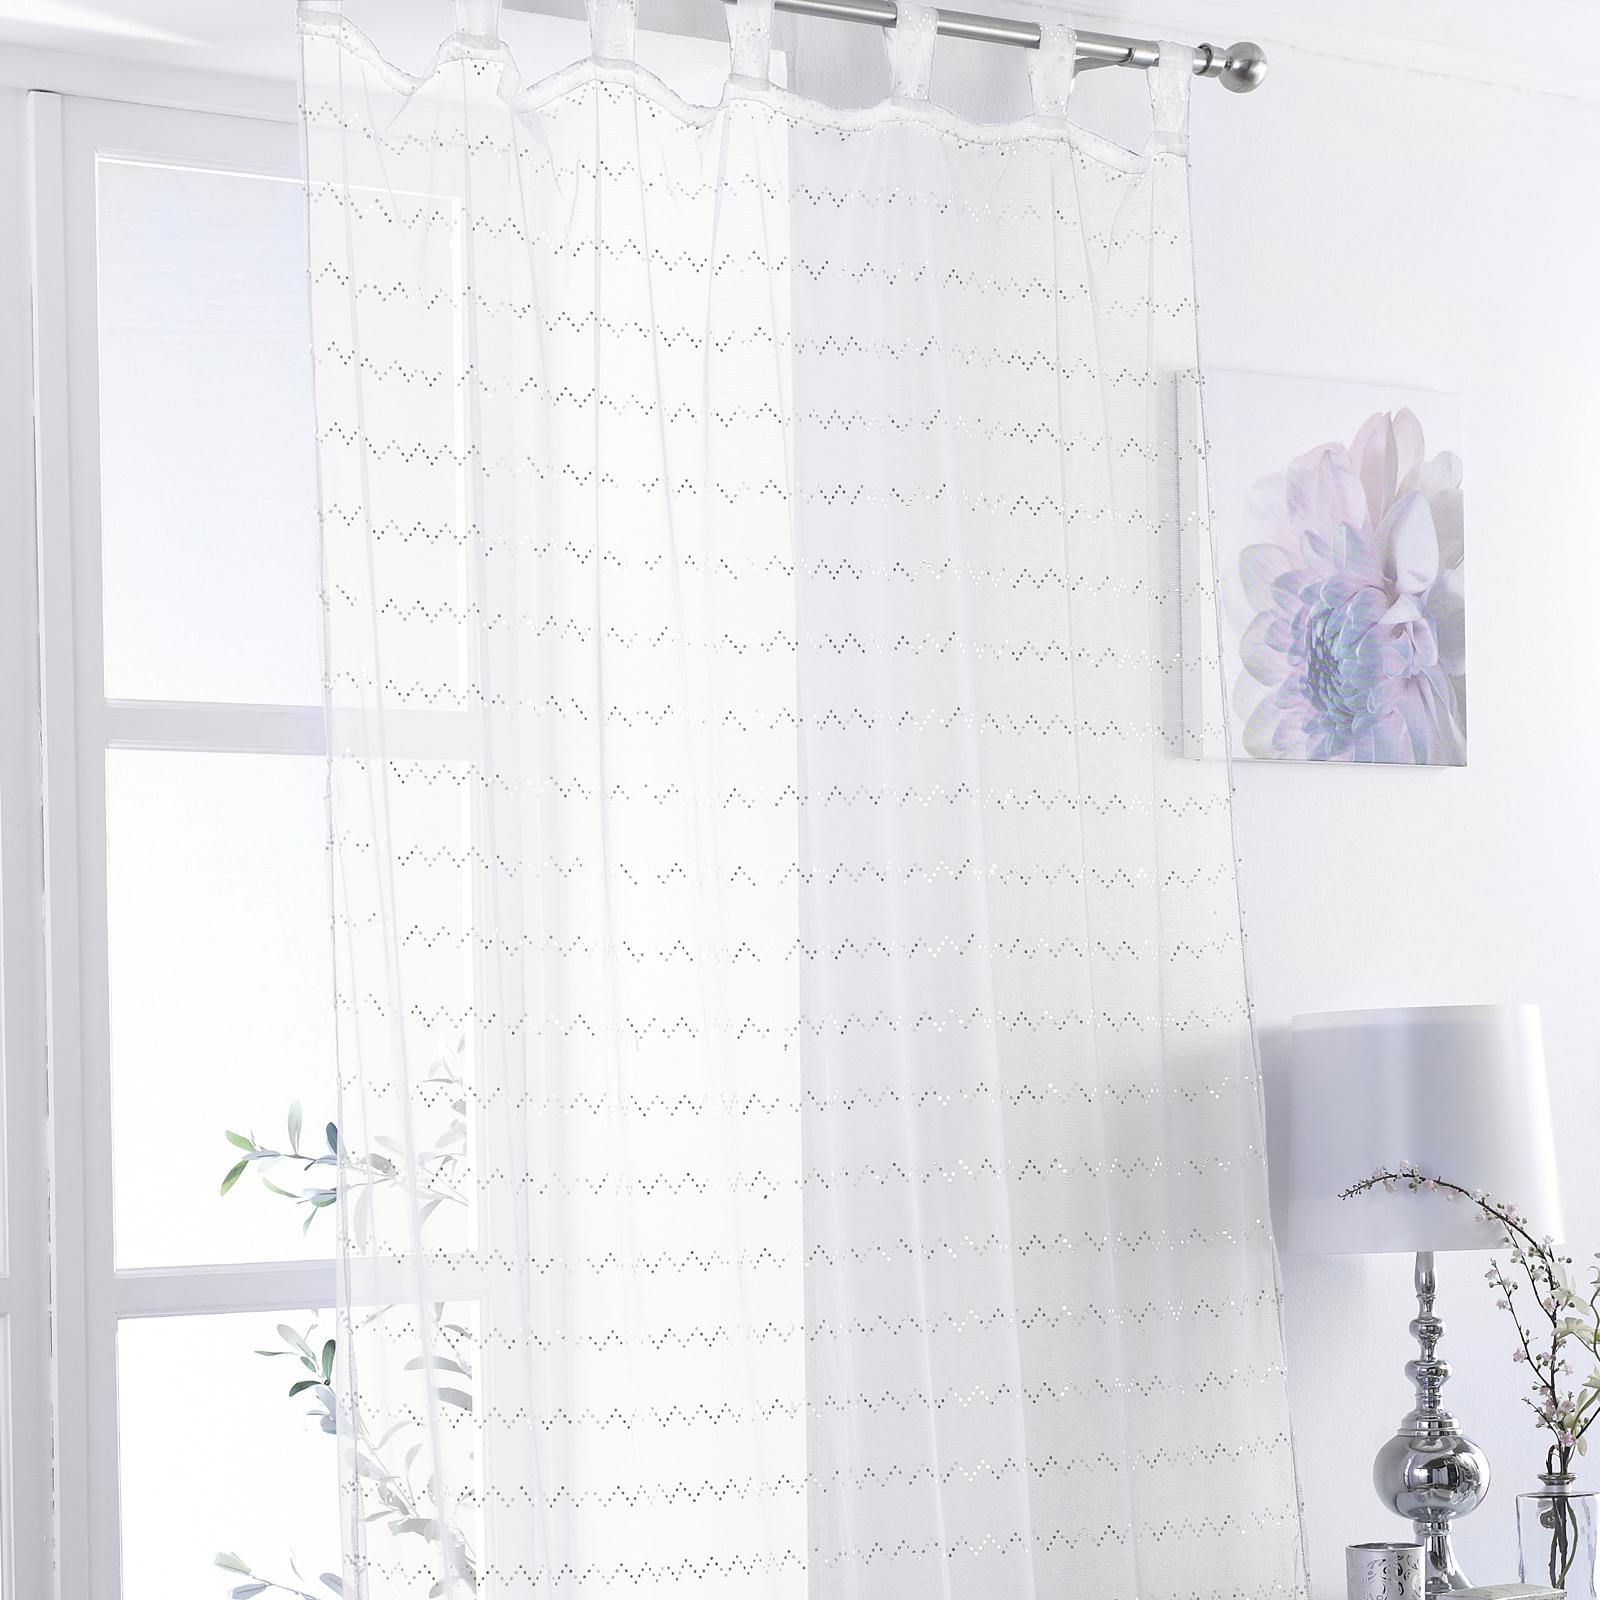 onglet top voile filet rideau panneau zig zag paillettes bed room play rose violet blanc ebay. Black Bedroom Furniture Sets. Home Design Ideas